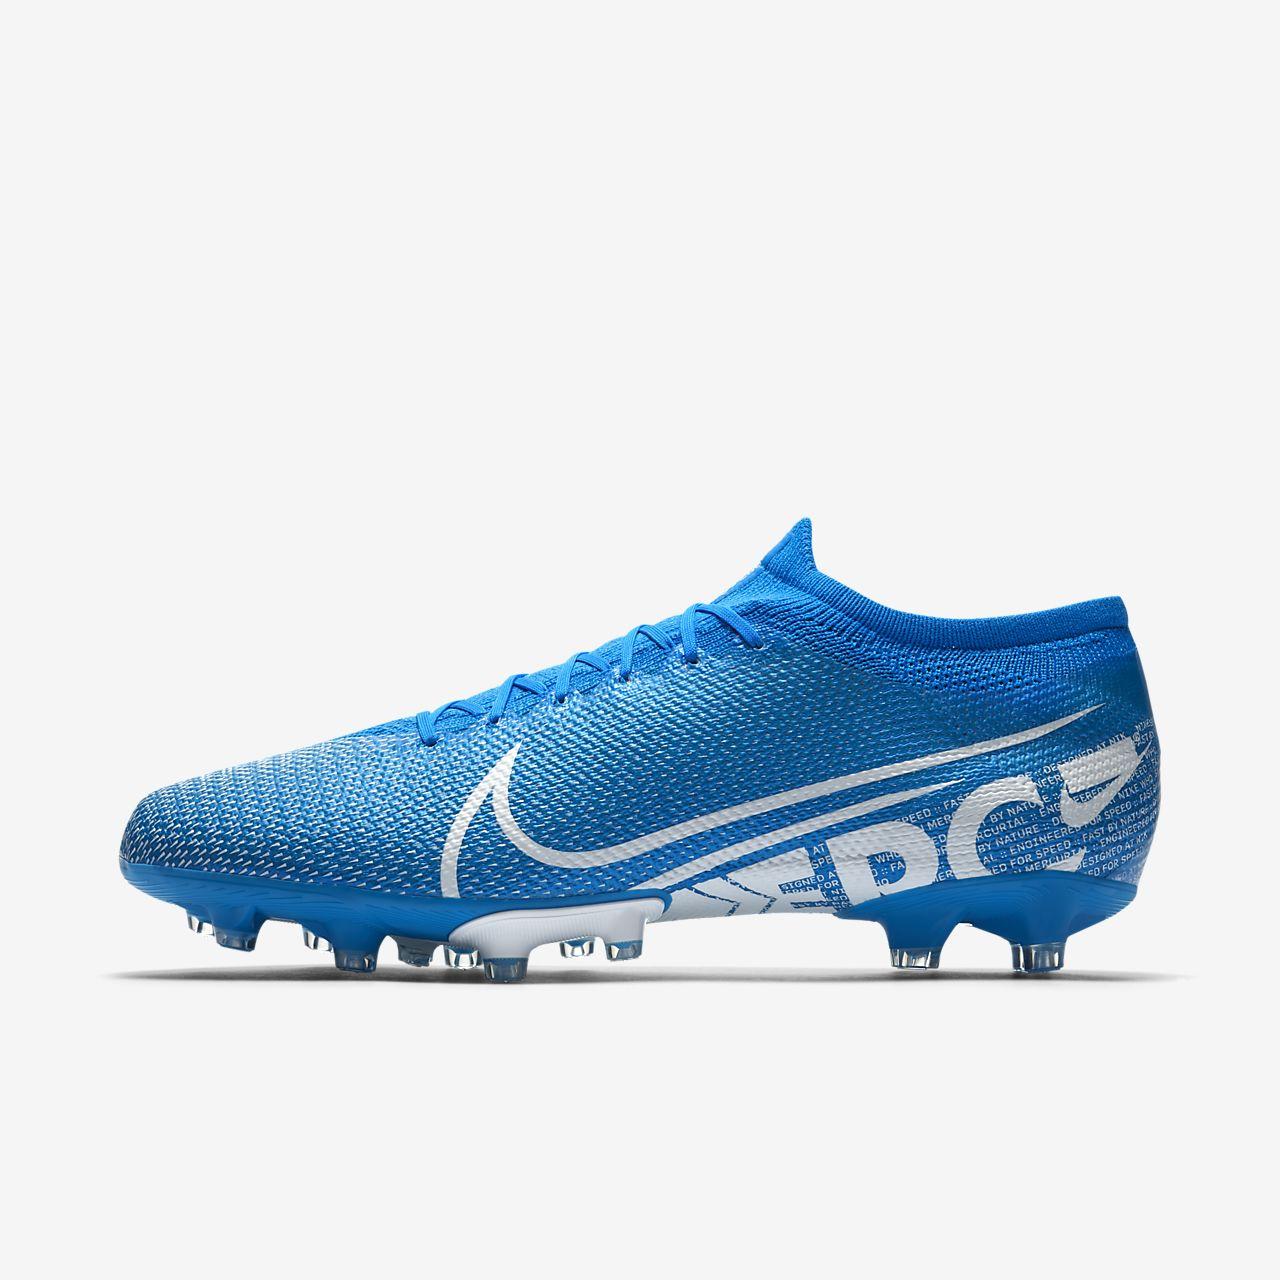 Boot Mercurial Ag Artificial Football Nike Pro 13 Vapor Grass Aj345RLq